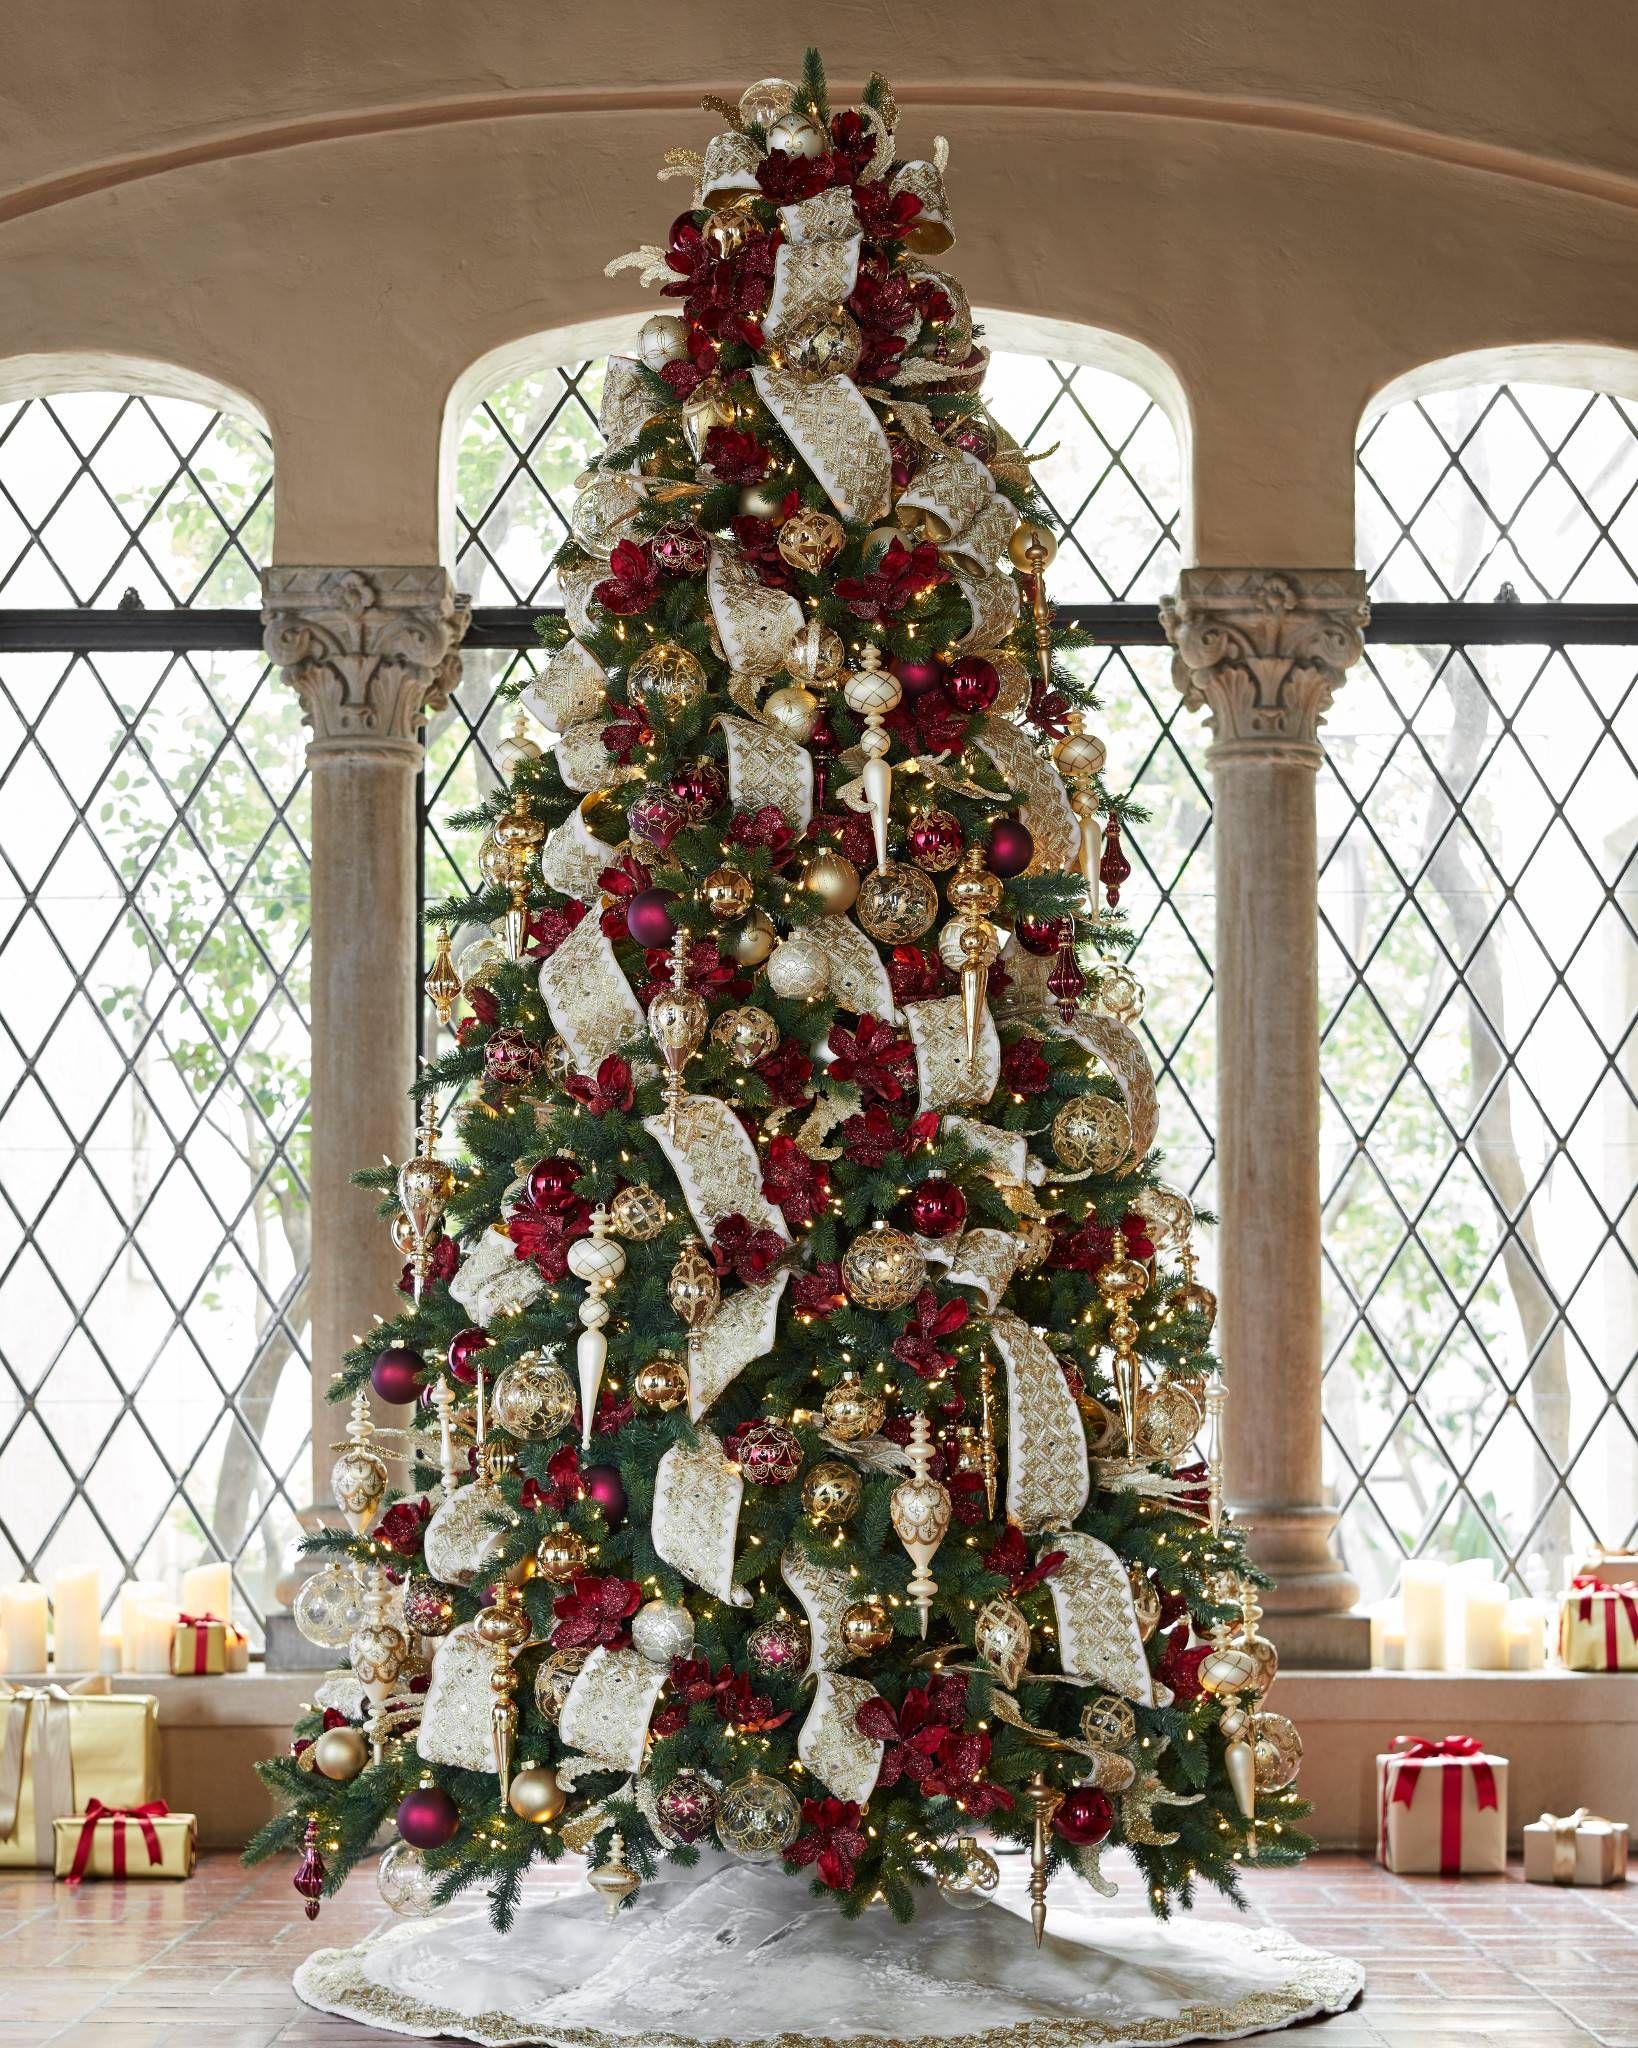 Biltmore Legacy Christmas Ornament Set Balsam Hill Elegant Christmas Trees Christmas Tree Themes Red Christmas Tree